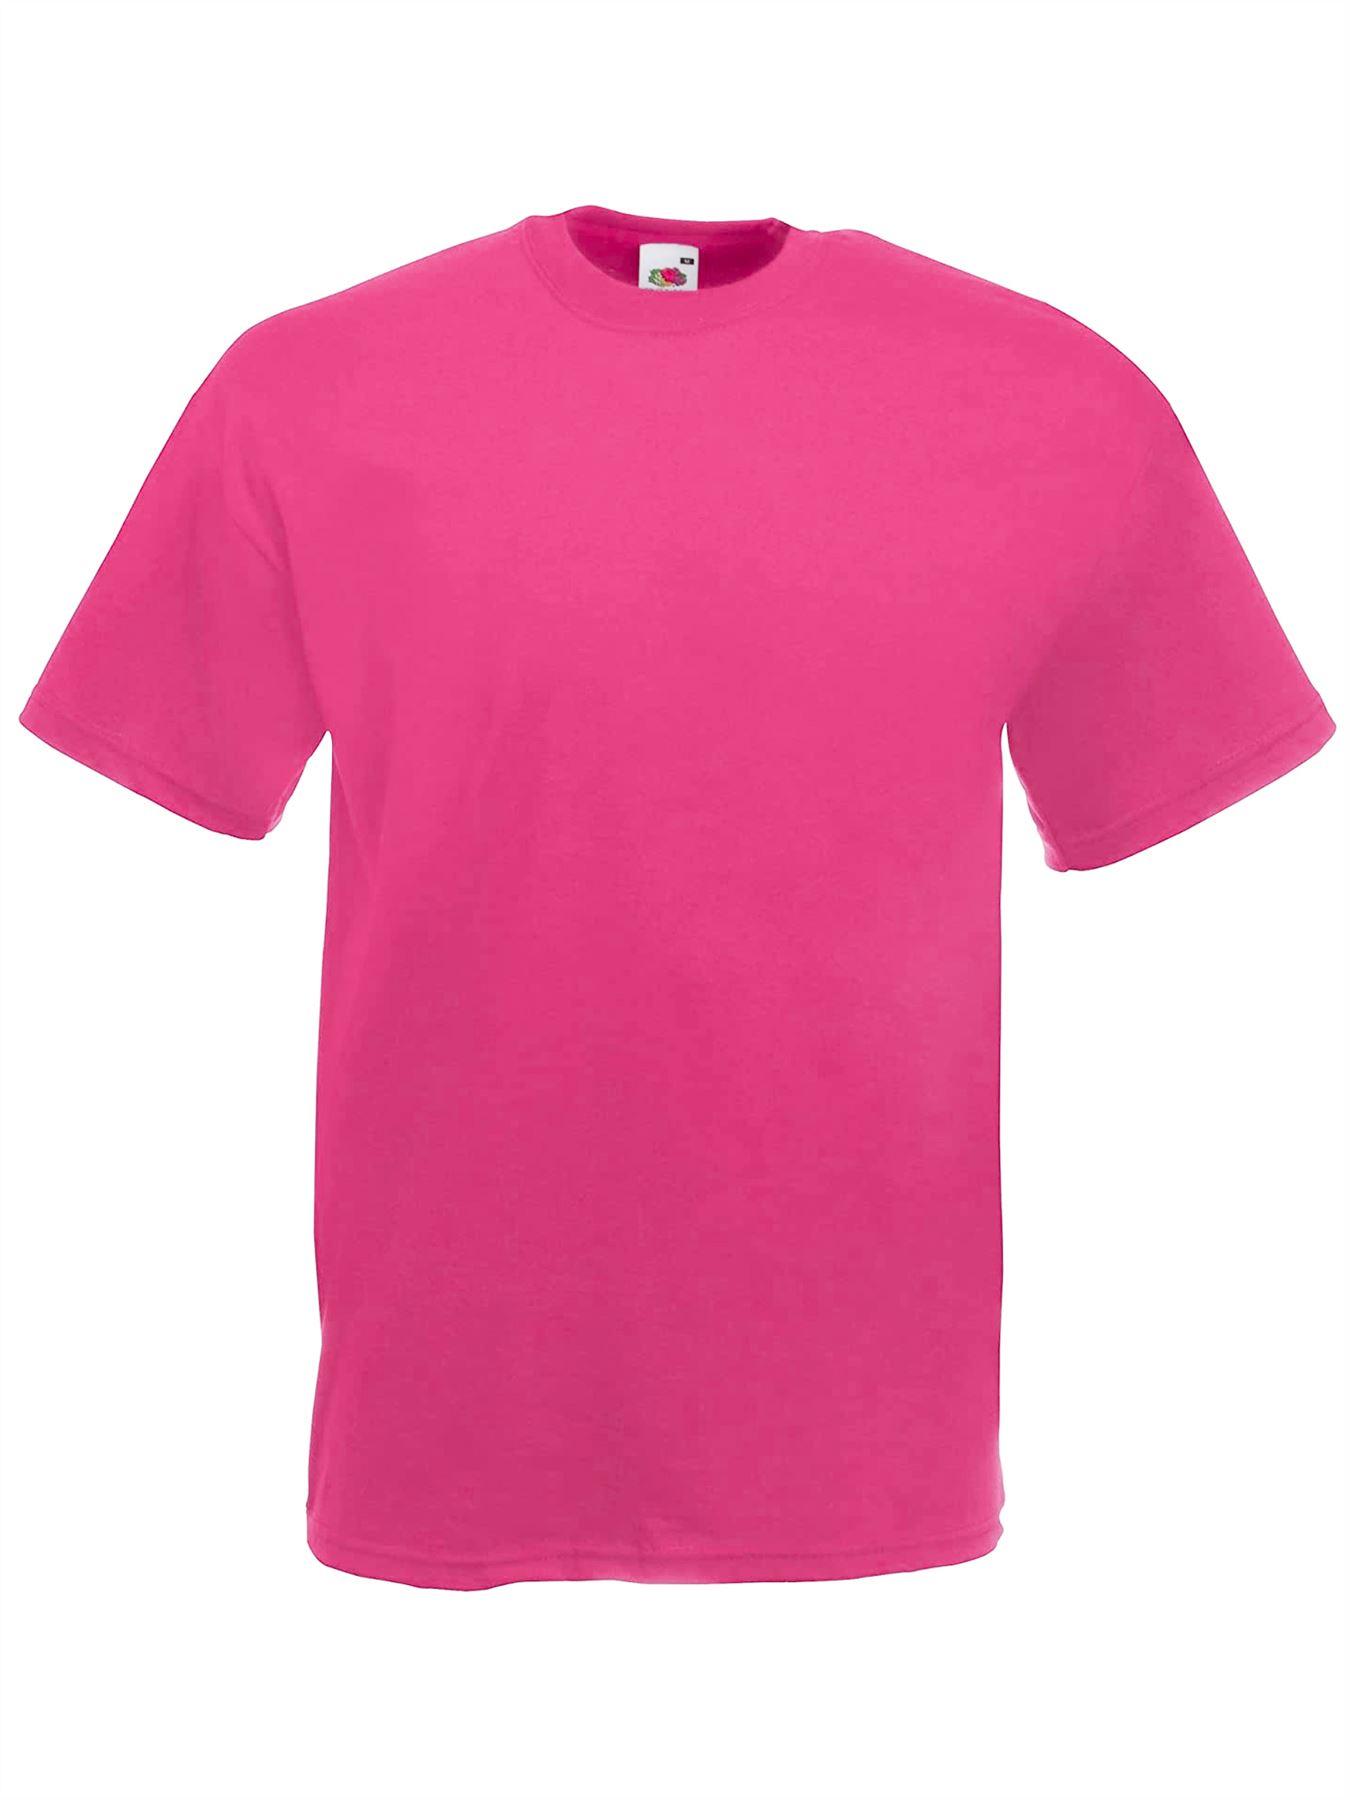 thumbnail 17 - Men-s-Fruit-Of-The-Loom-T-Shirt-Original-100-Cotton-Casual-Plain-Top-Tee